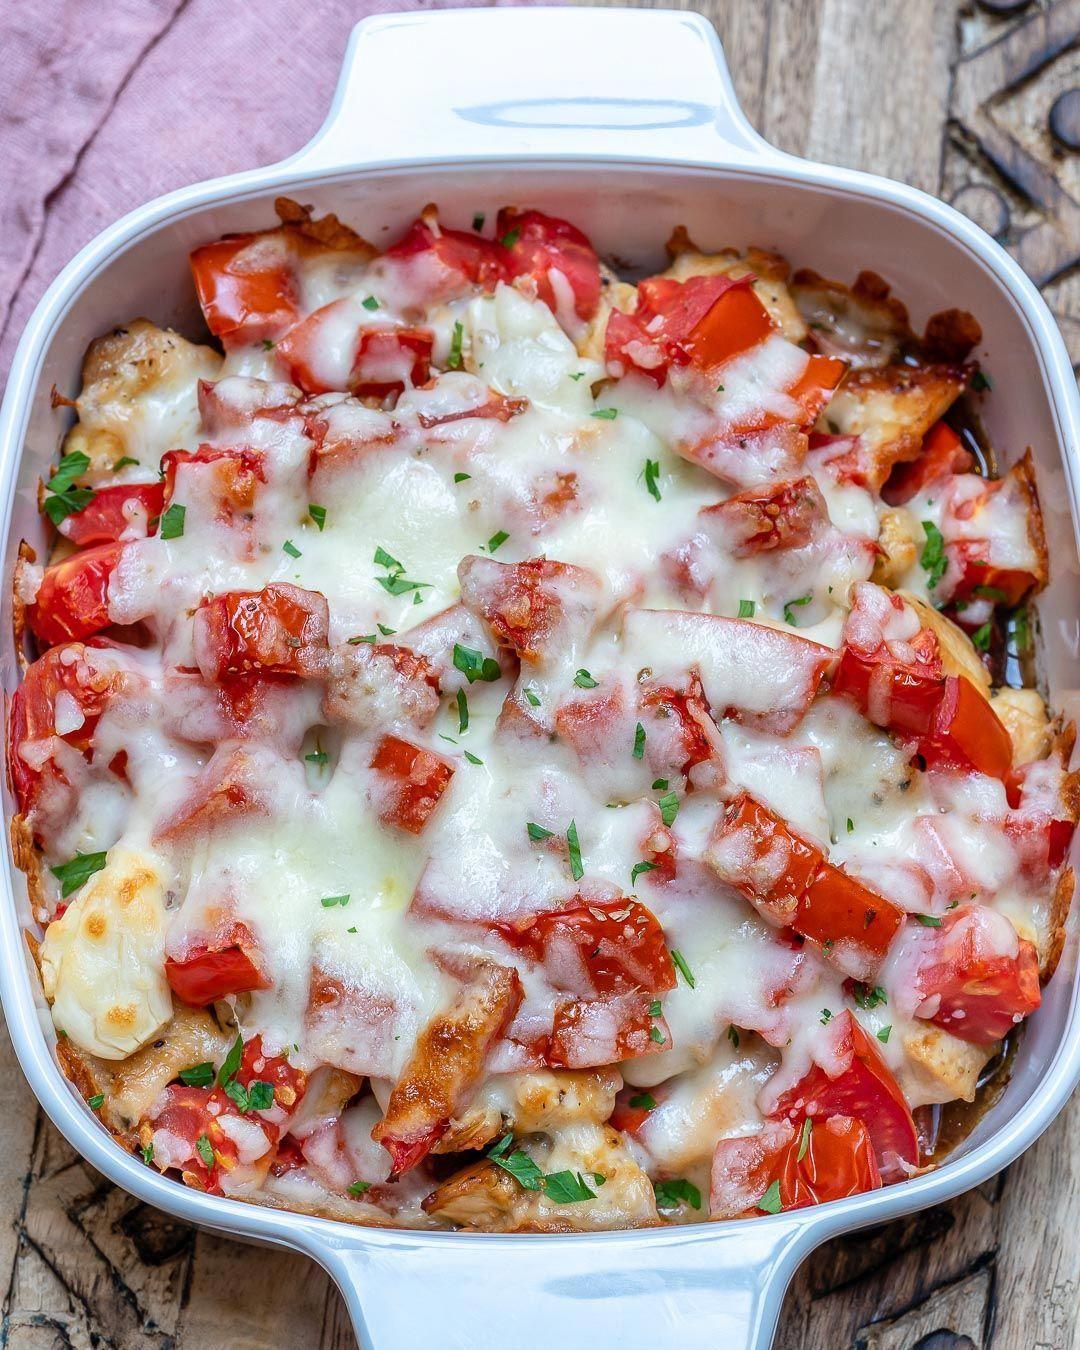 Bruschetta Chicken Casserole for a Delicious Clean Eating Dinner Idea!